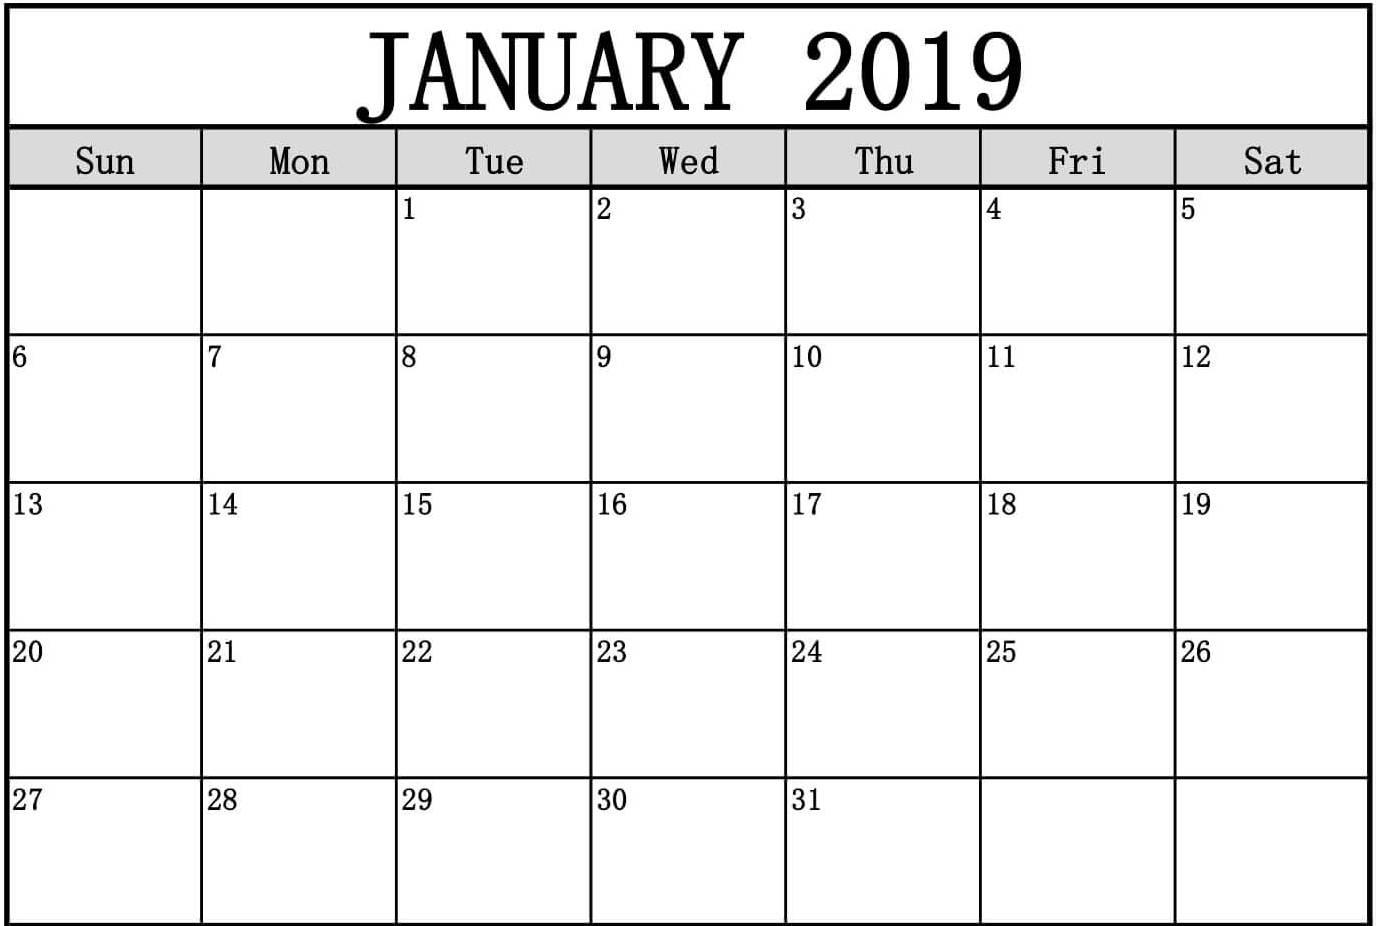 January 2019 Calendar Page to Print